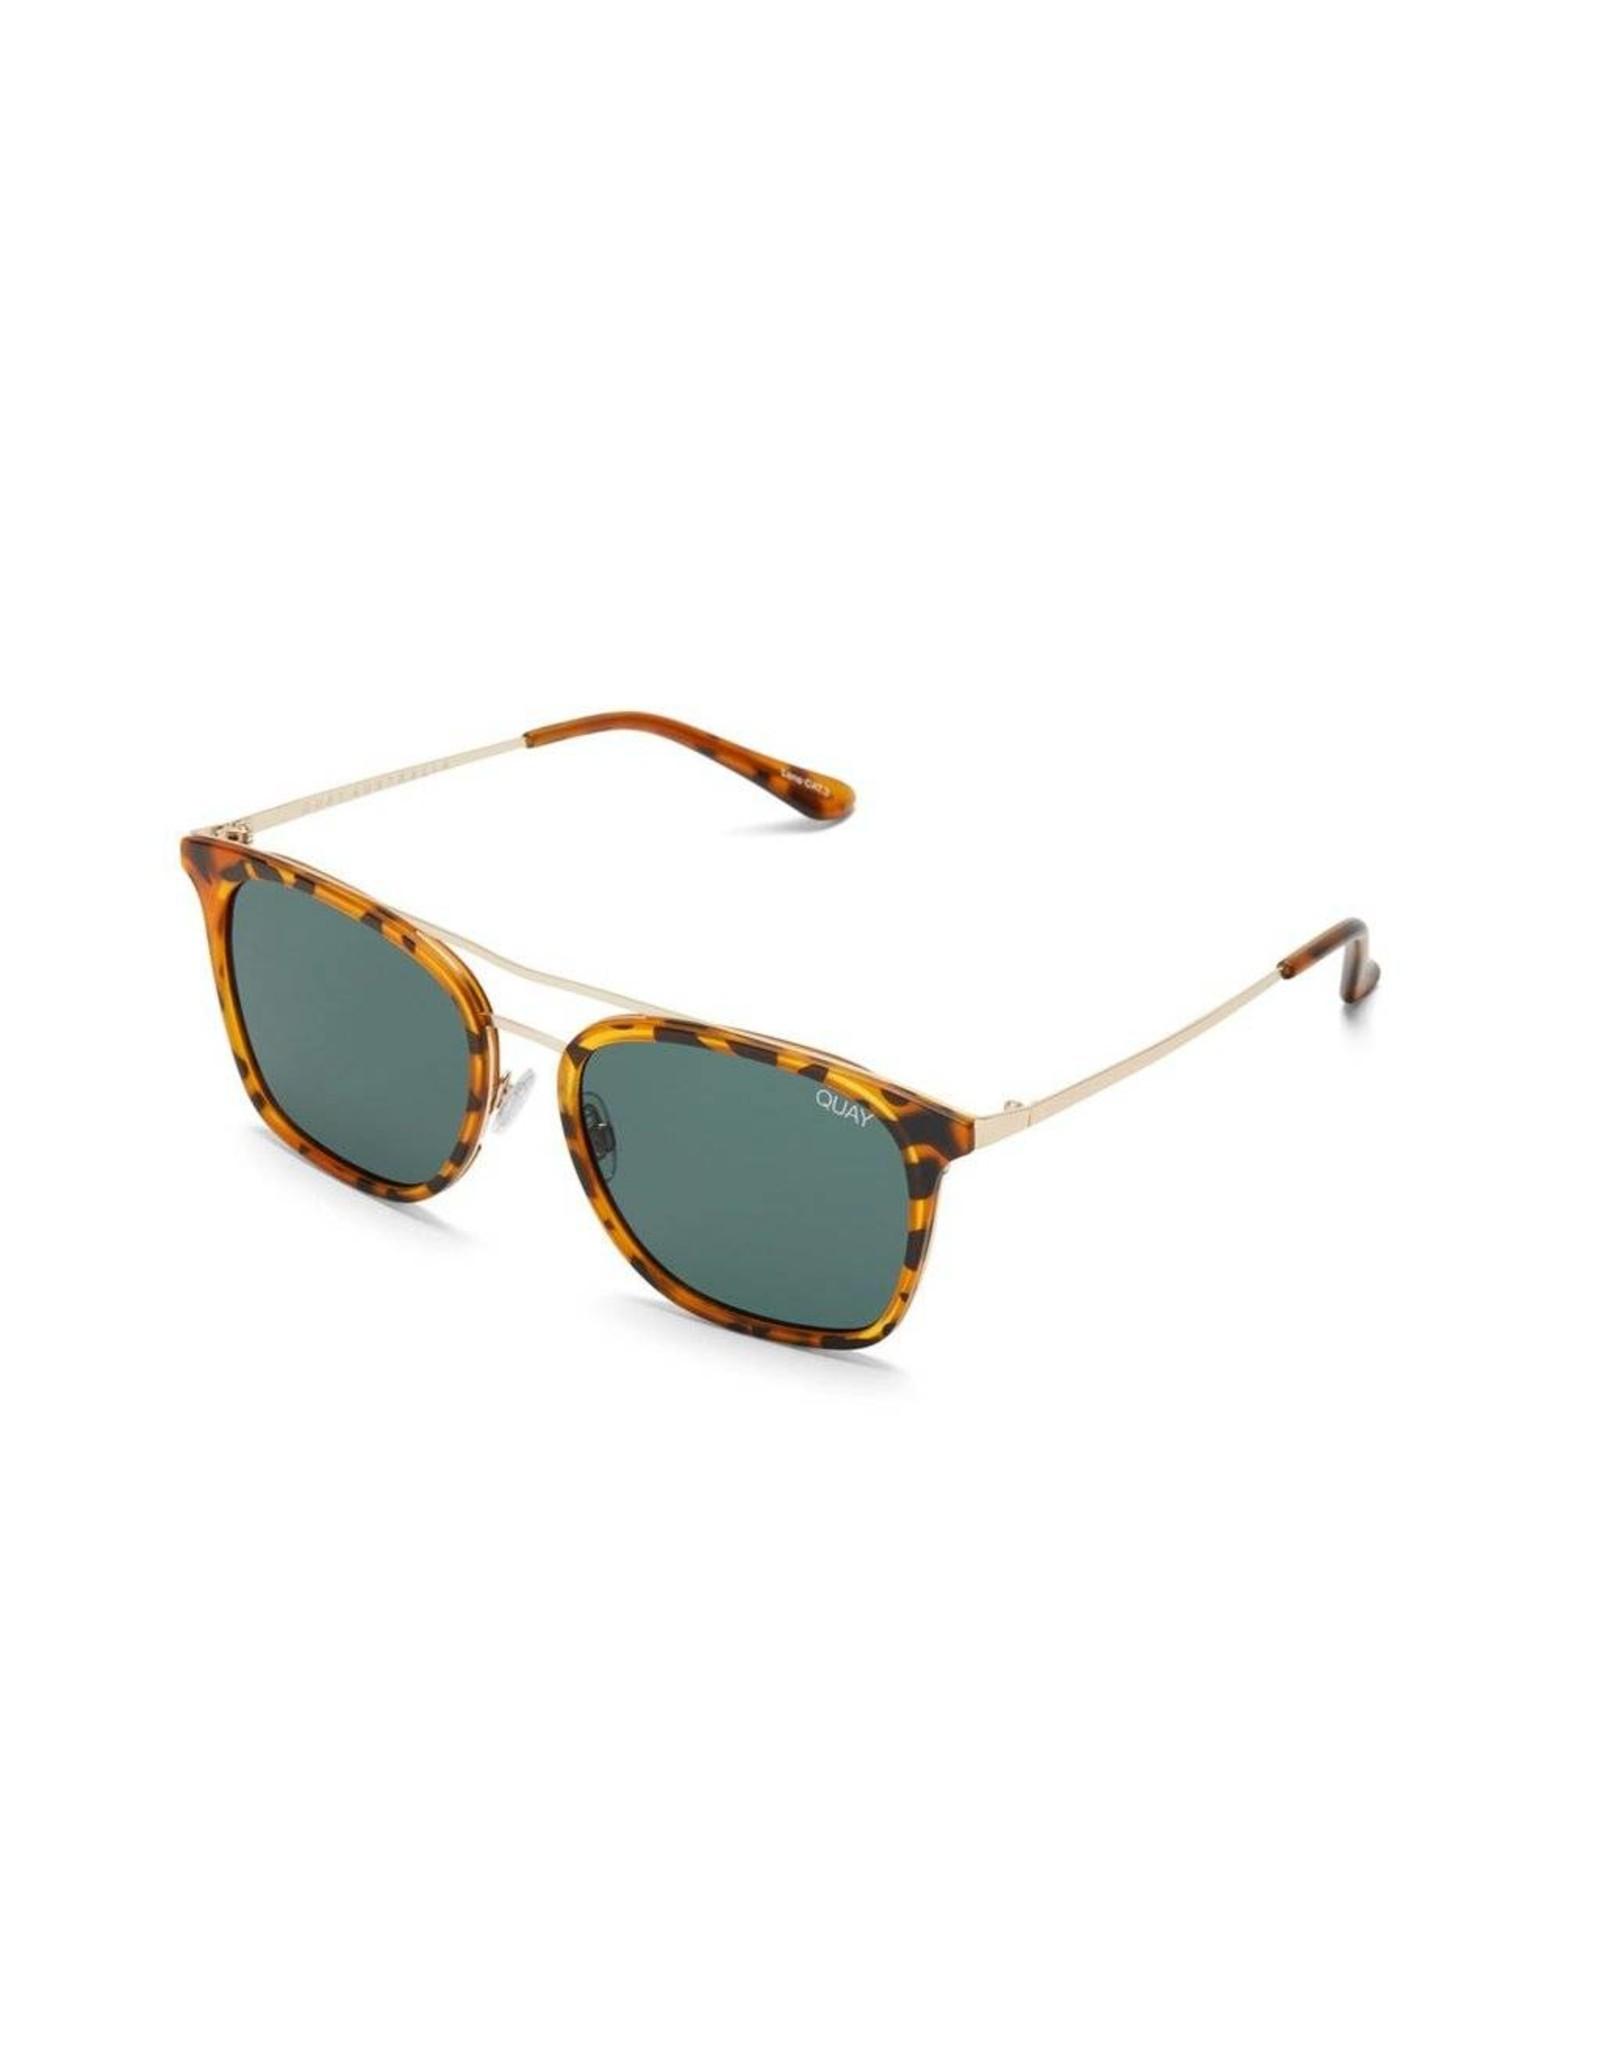 Quay Australia Byron Sunglasses